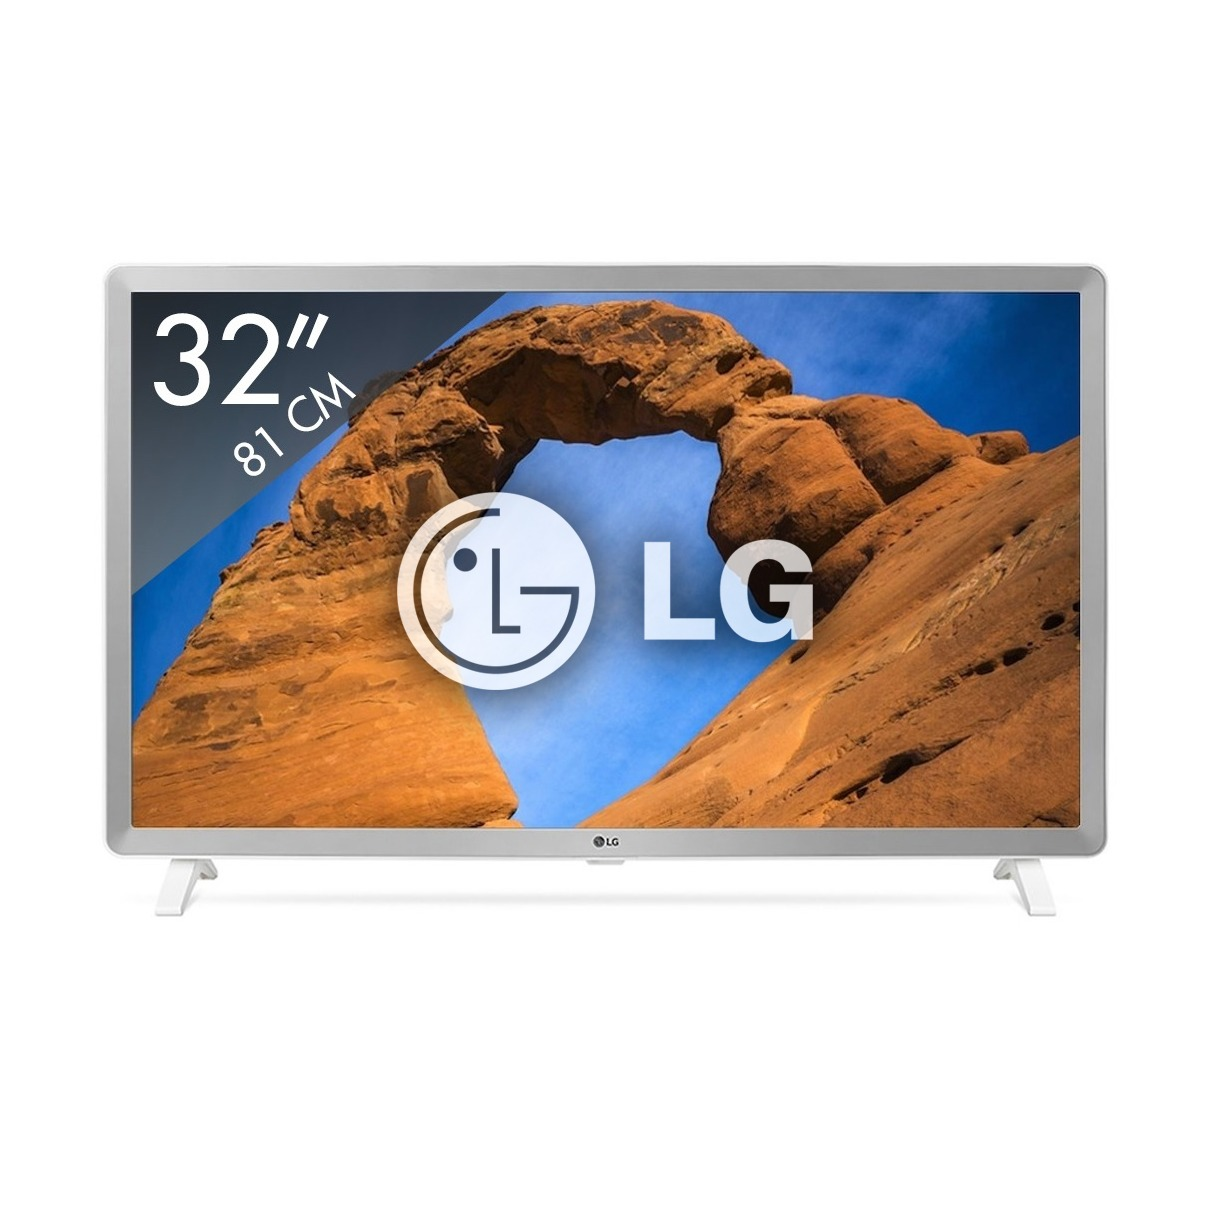 LG LED TV 32LK6200